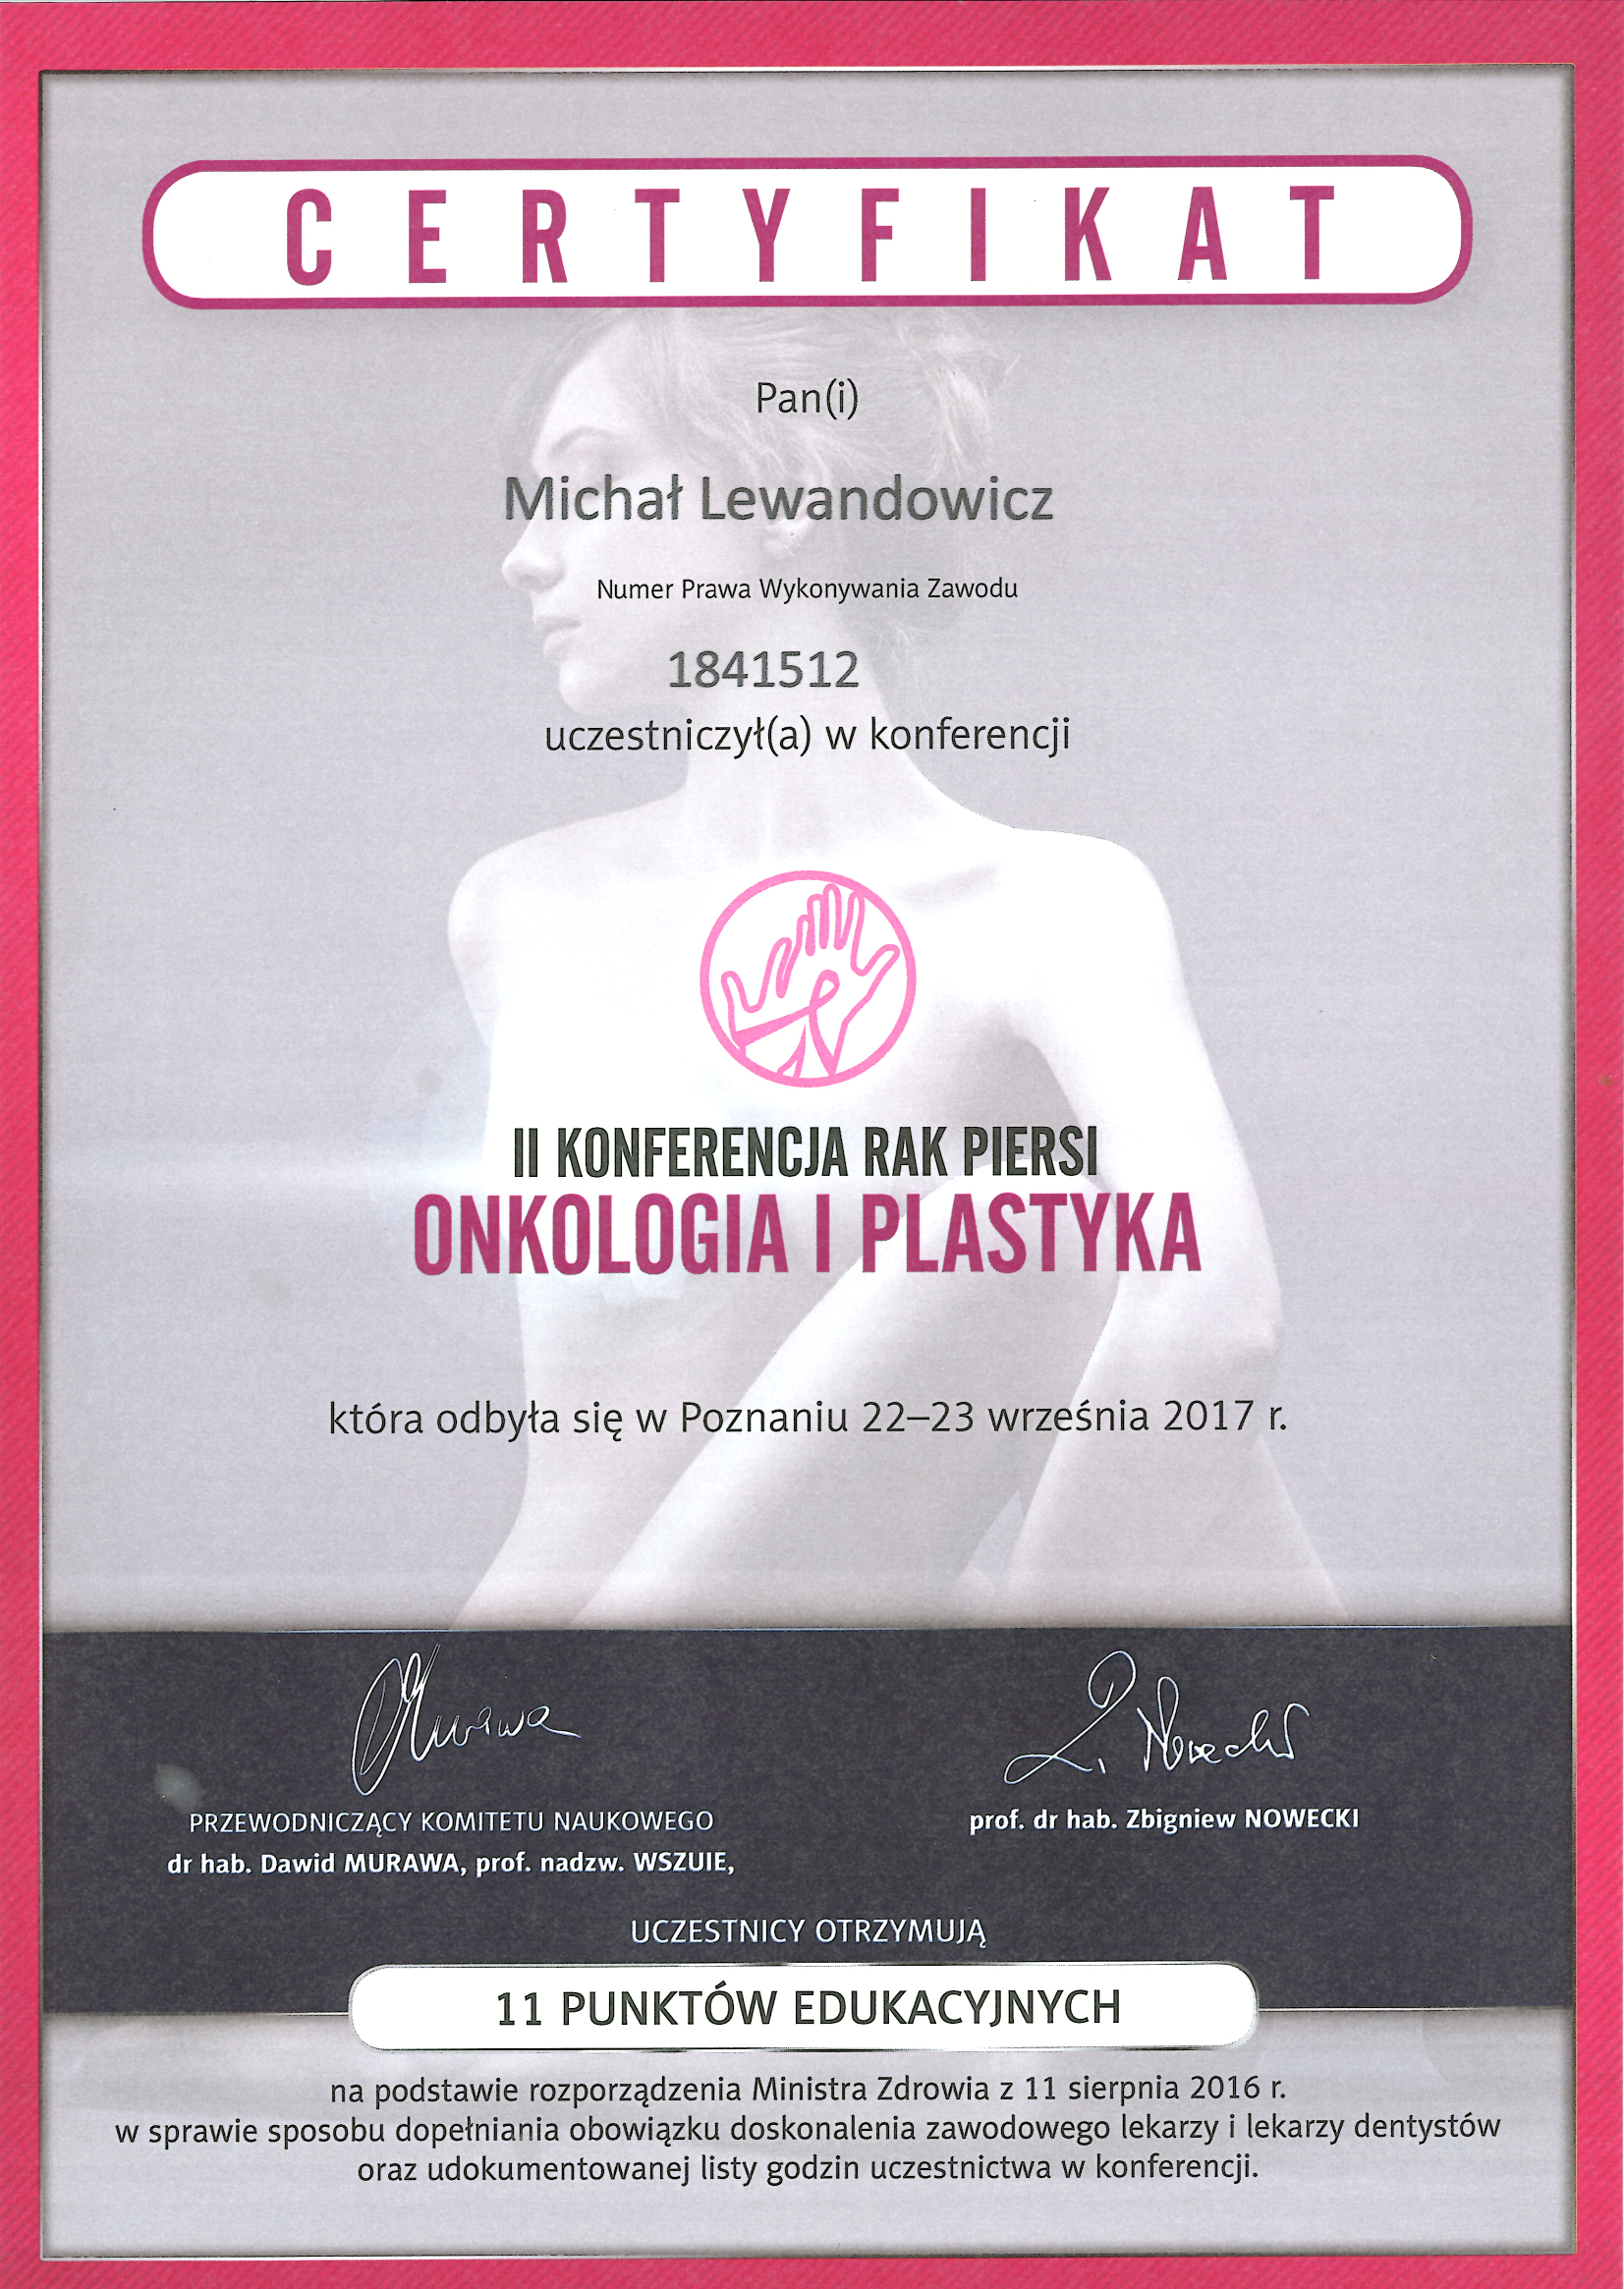 Cert OnkologiaiPlastyka 2017 - dr n. med. Michał Lewandowicz